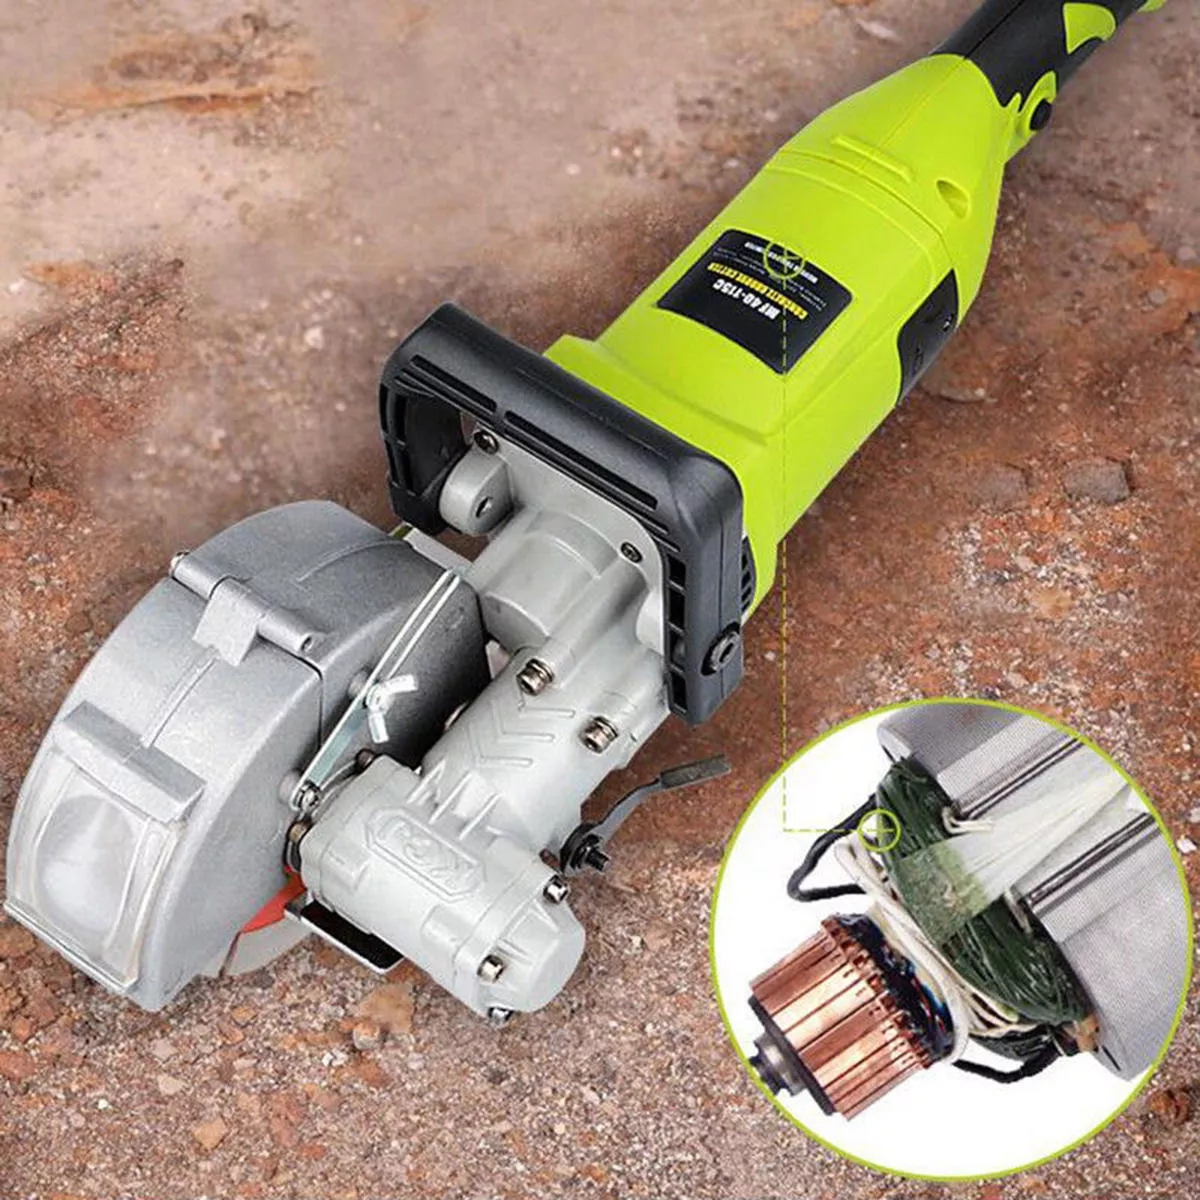 MOYI 4 кВт электрическая стеновая канавочная машина долбежная машина для резки